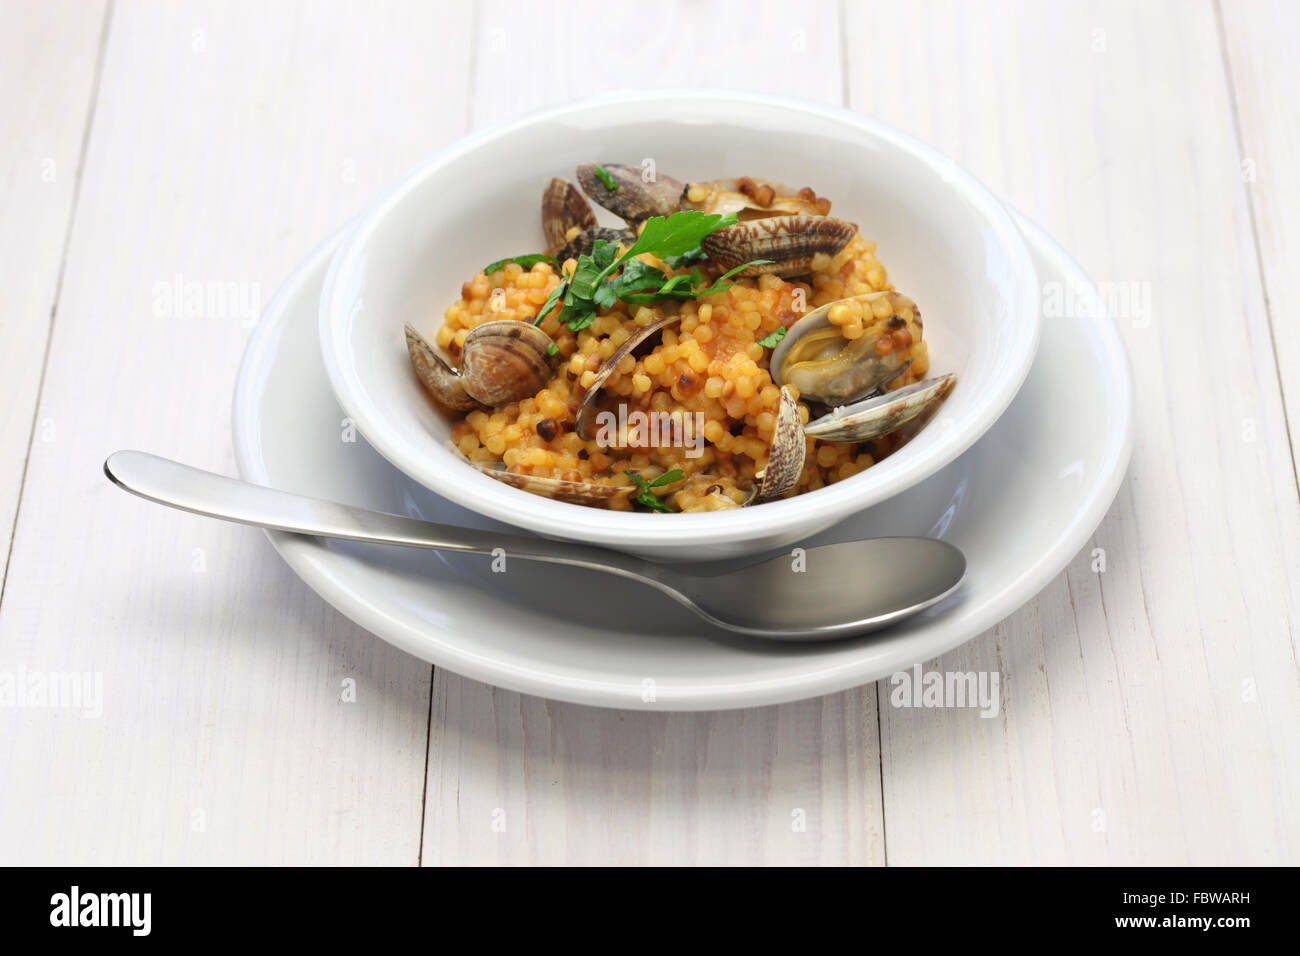 sardinian pasta with clams, italian cuisine, fregula con vongole, fregola con arselle - Stock Image